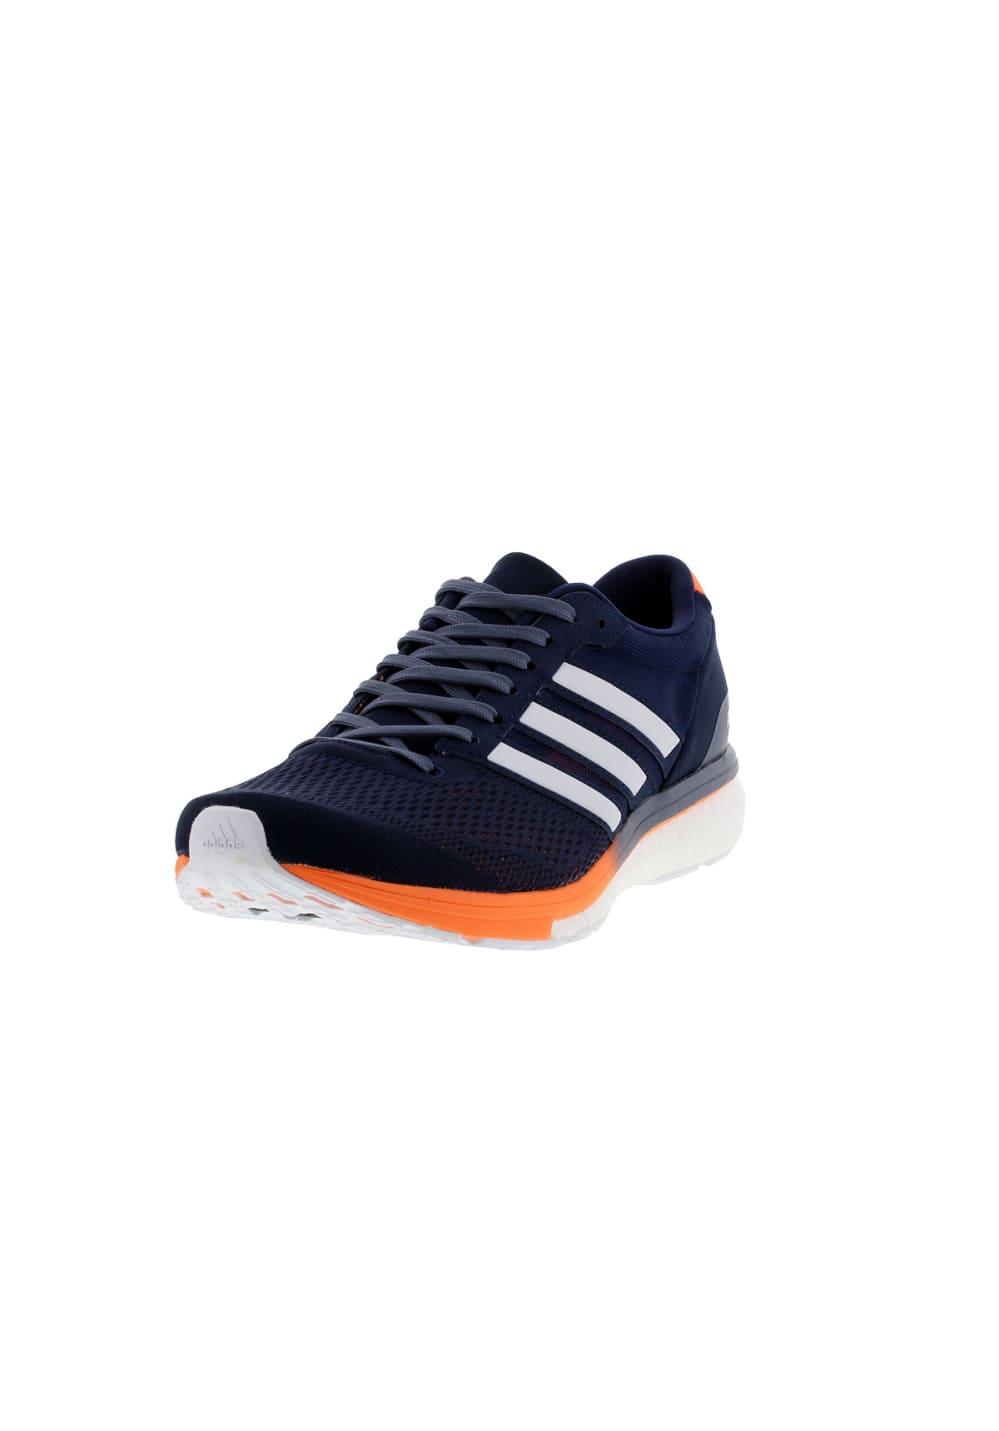 b9bcaf695e4a adidas-adizero-boston-6-running-shoes-men-black-pid-000000000010138028.jpg